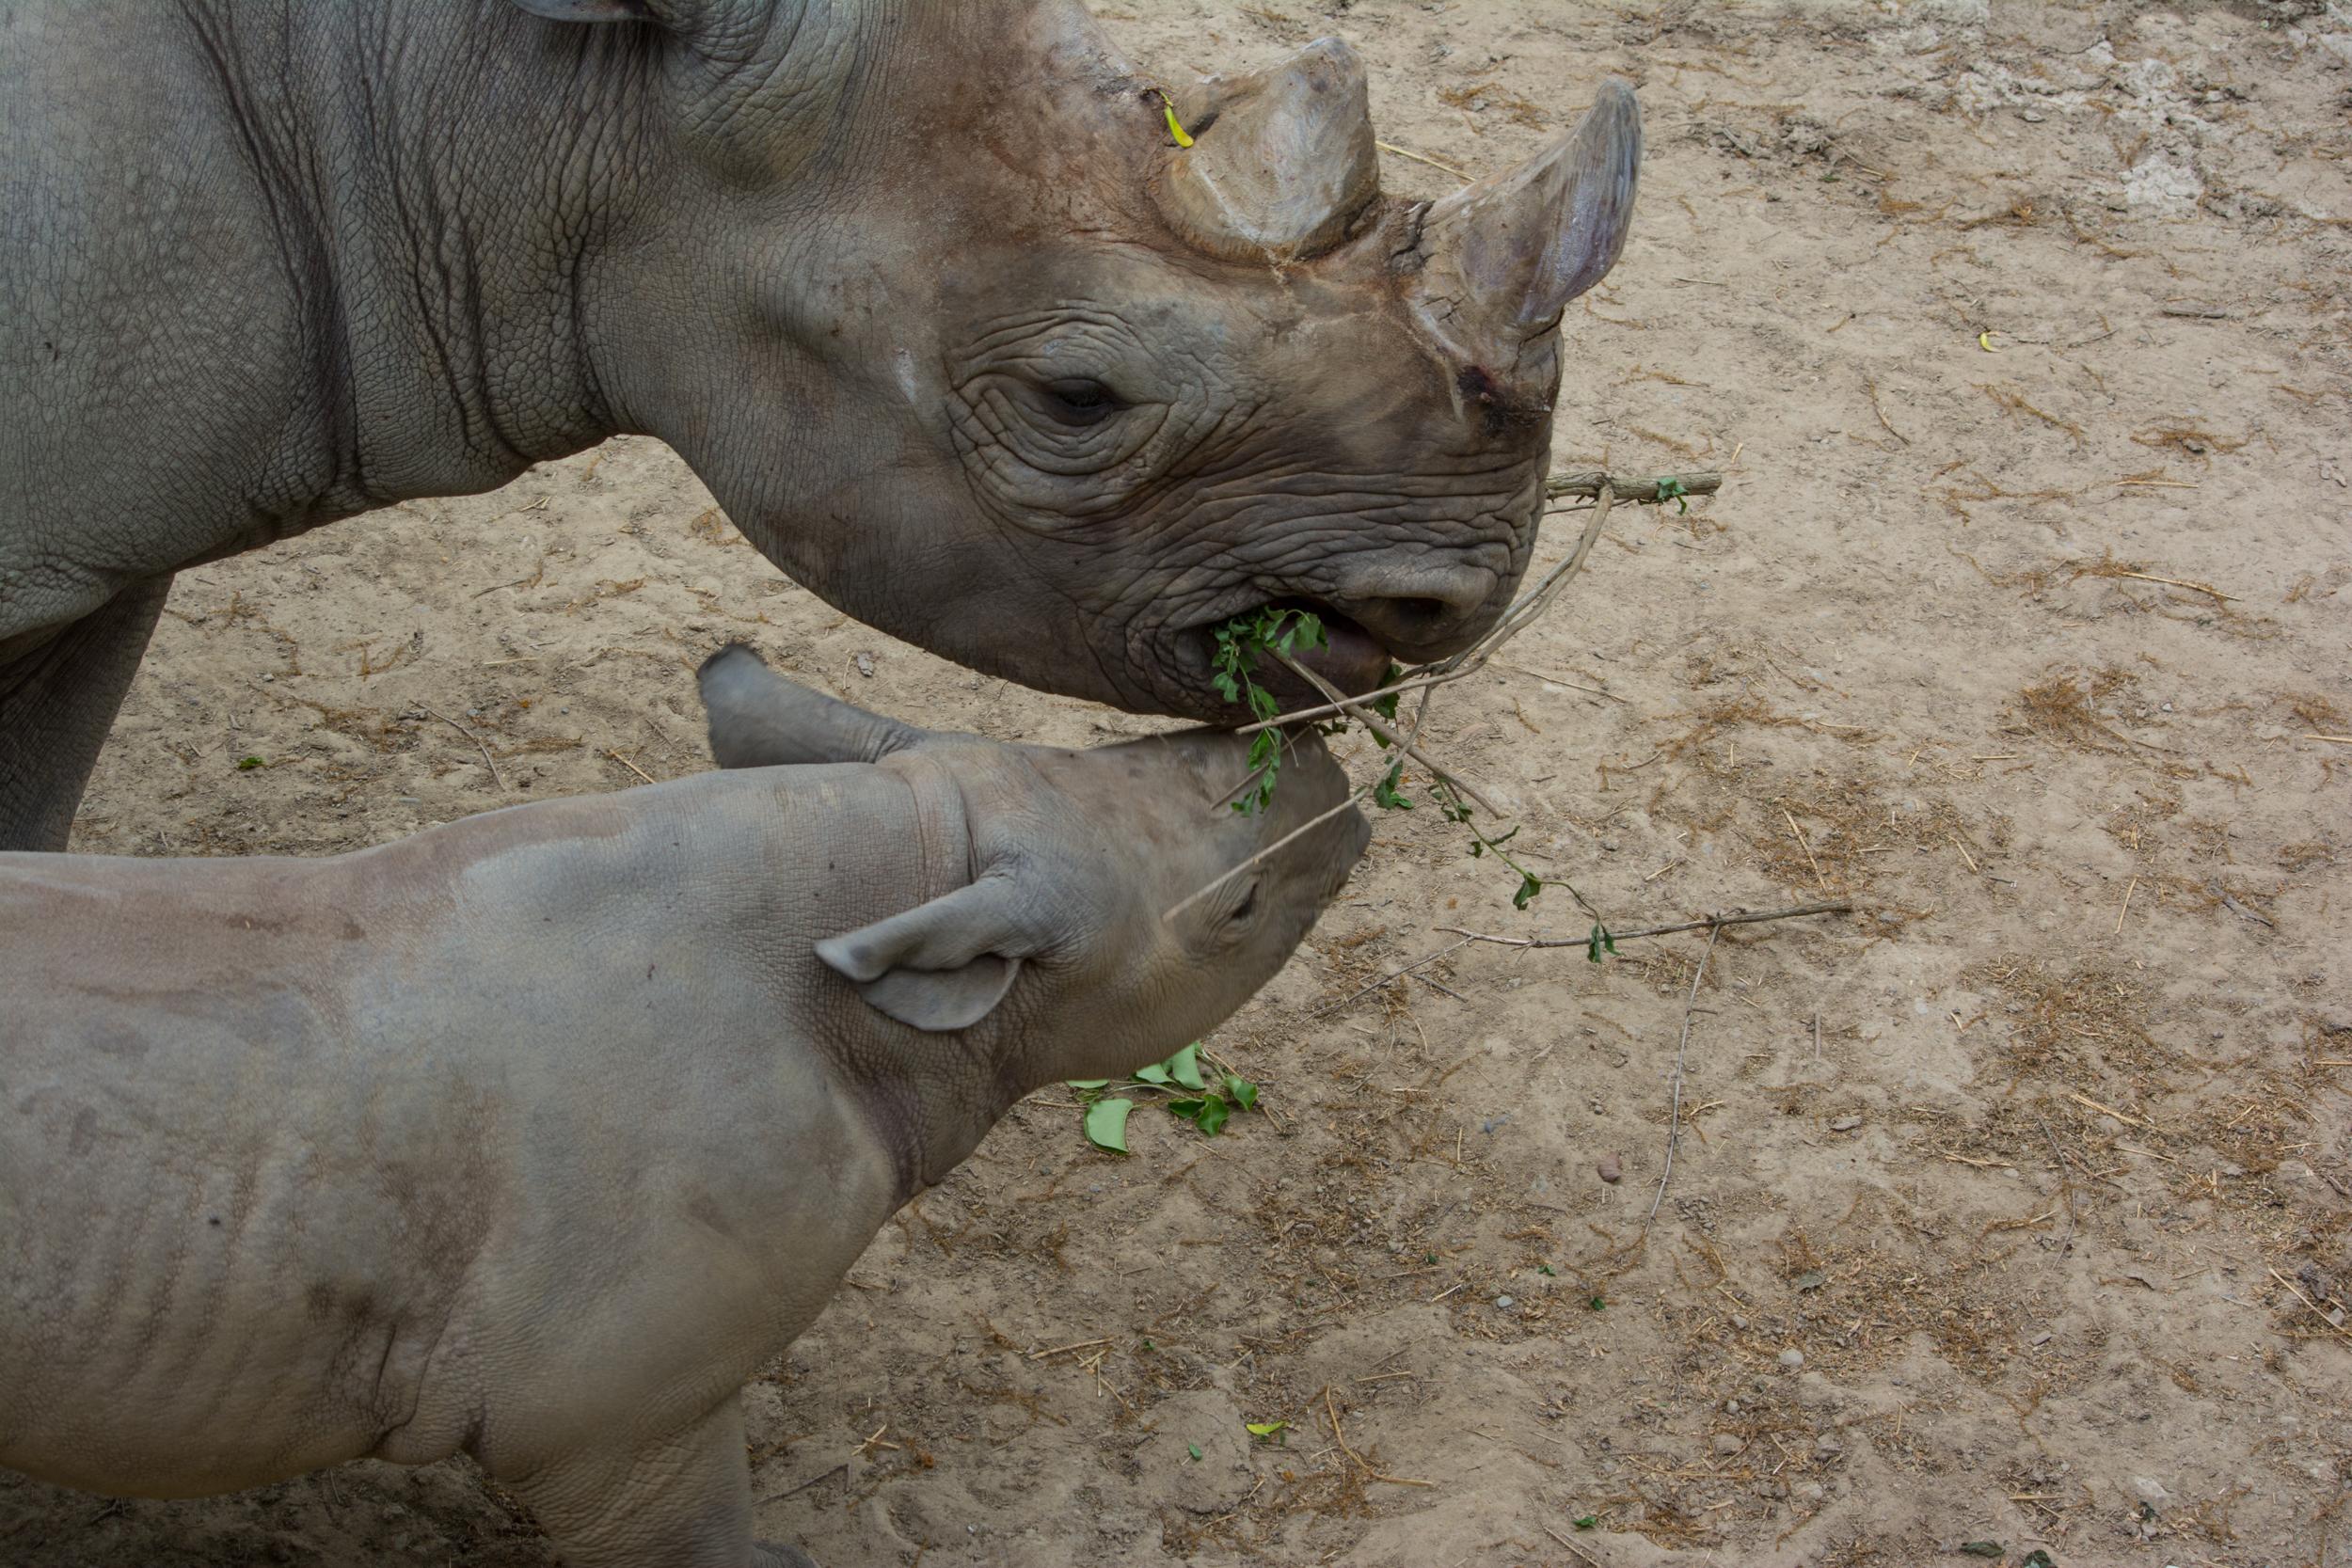 baby rhino 02 - Cleveland Zoo